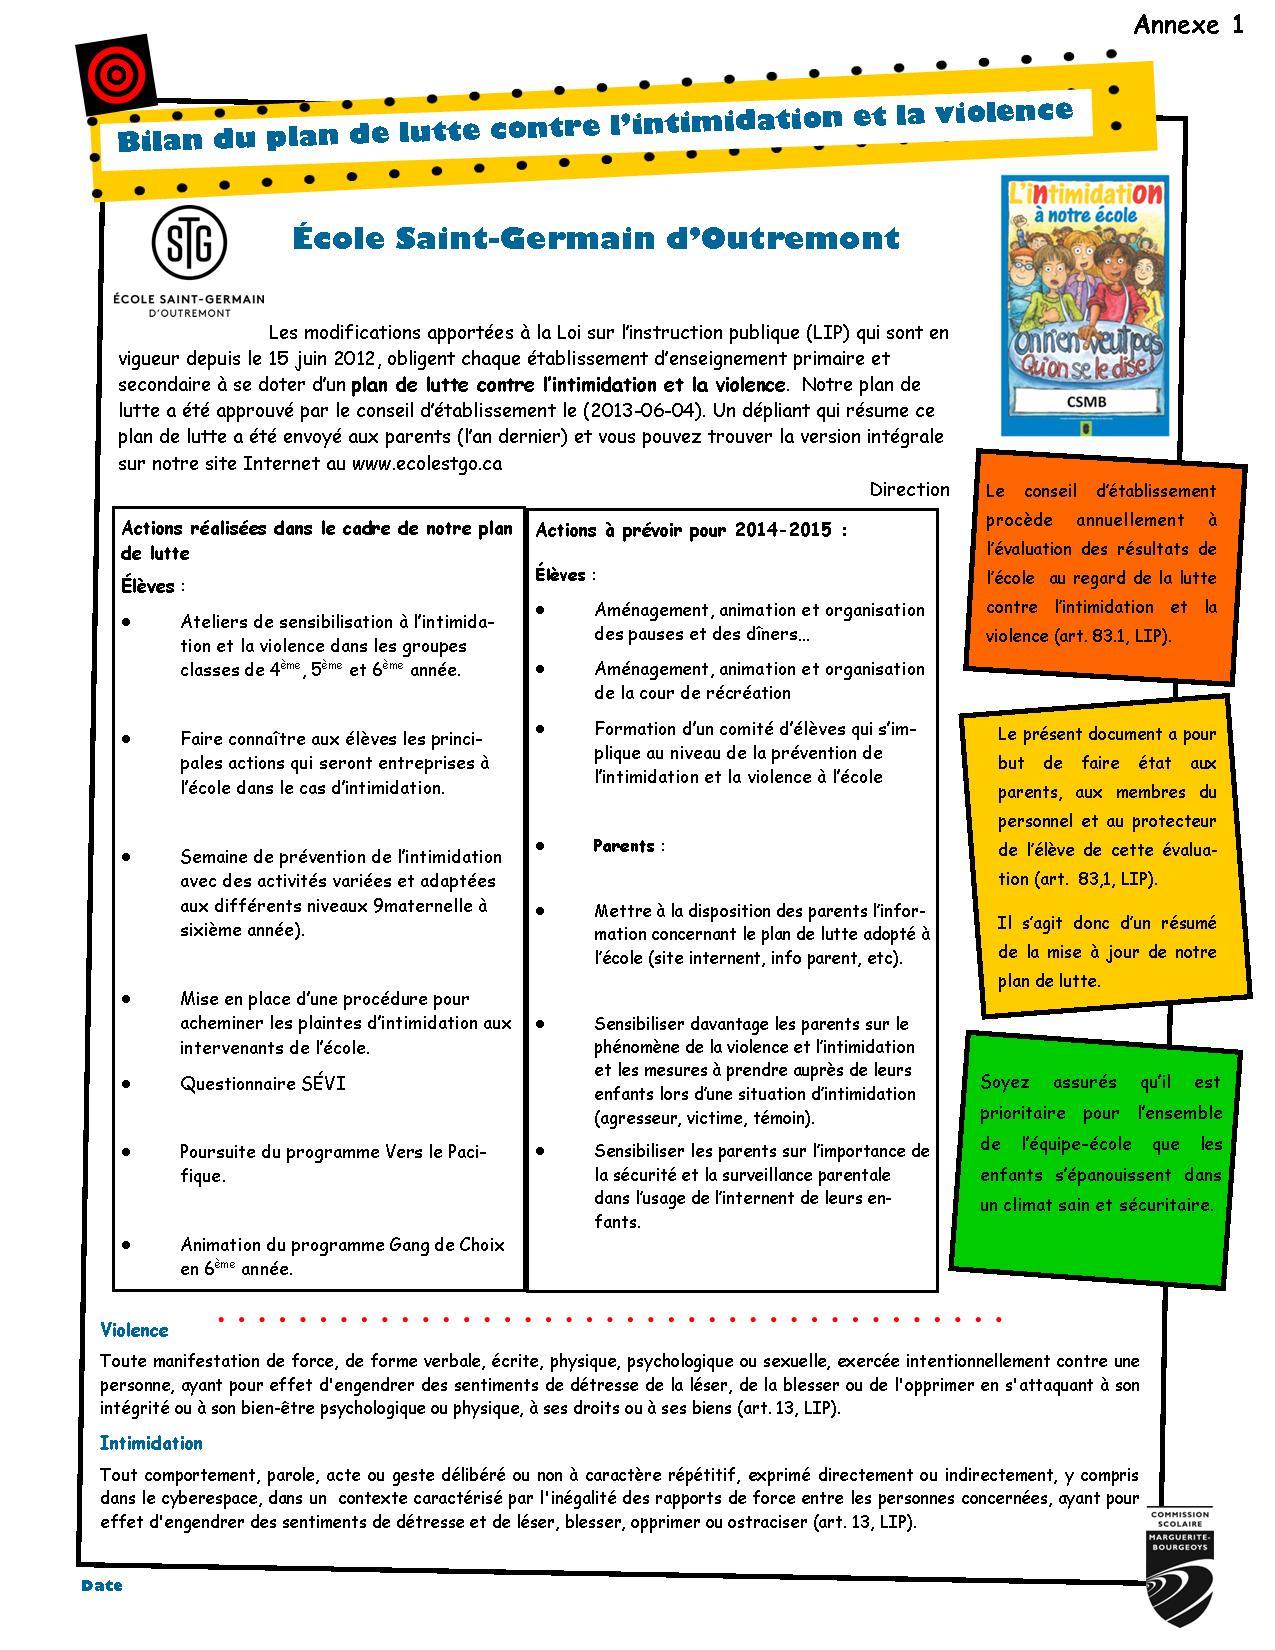 Annexe 1 Diffusion bilan plan de lutte 2014-2015